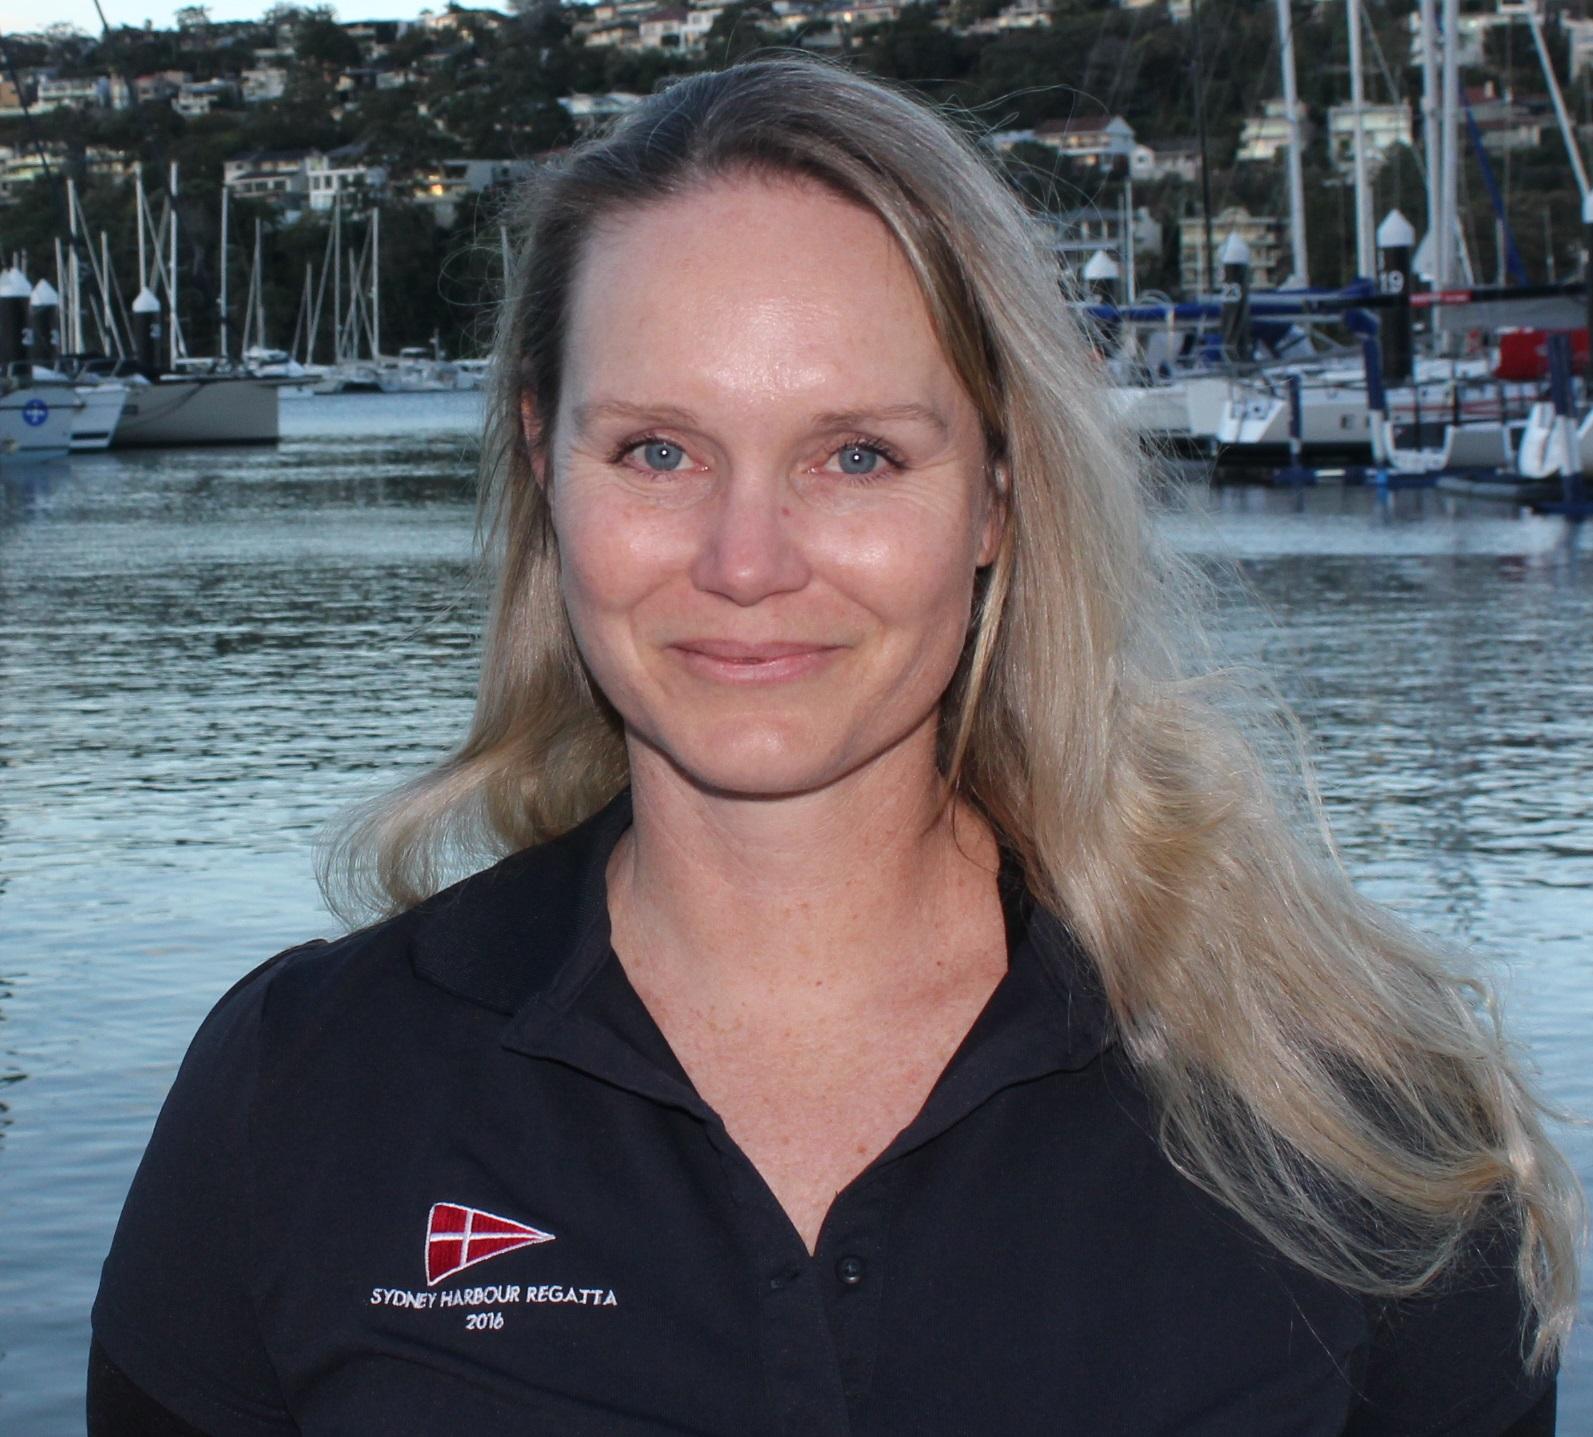 MHYC Discover Sailing Team Elizabeth Turner